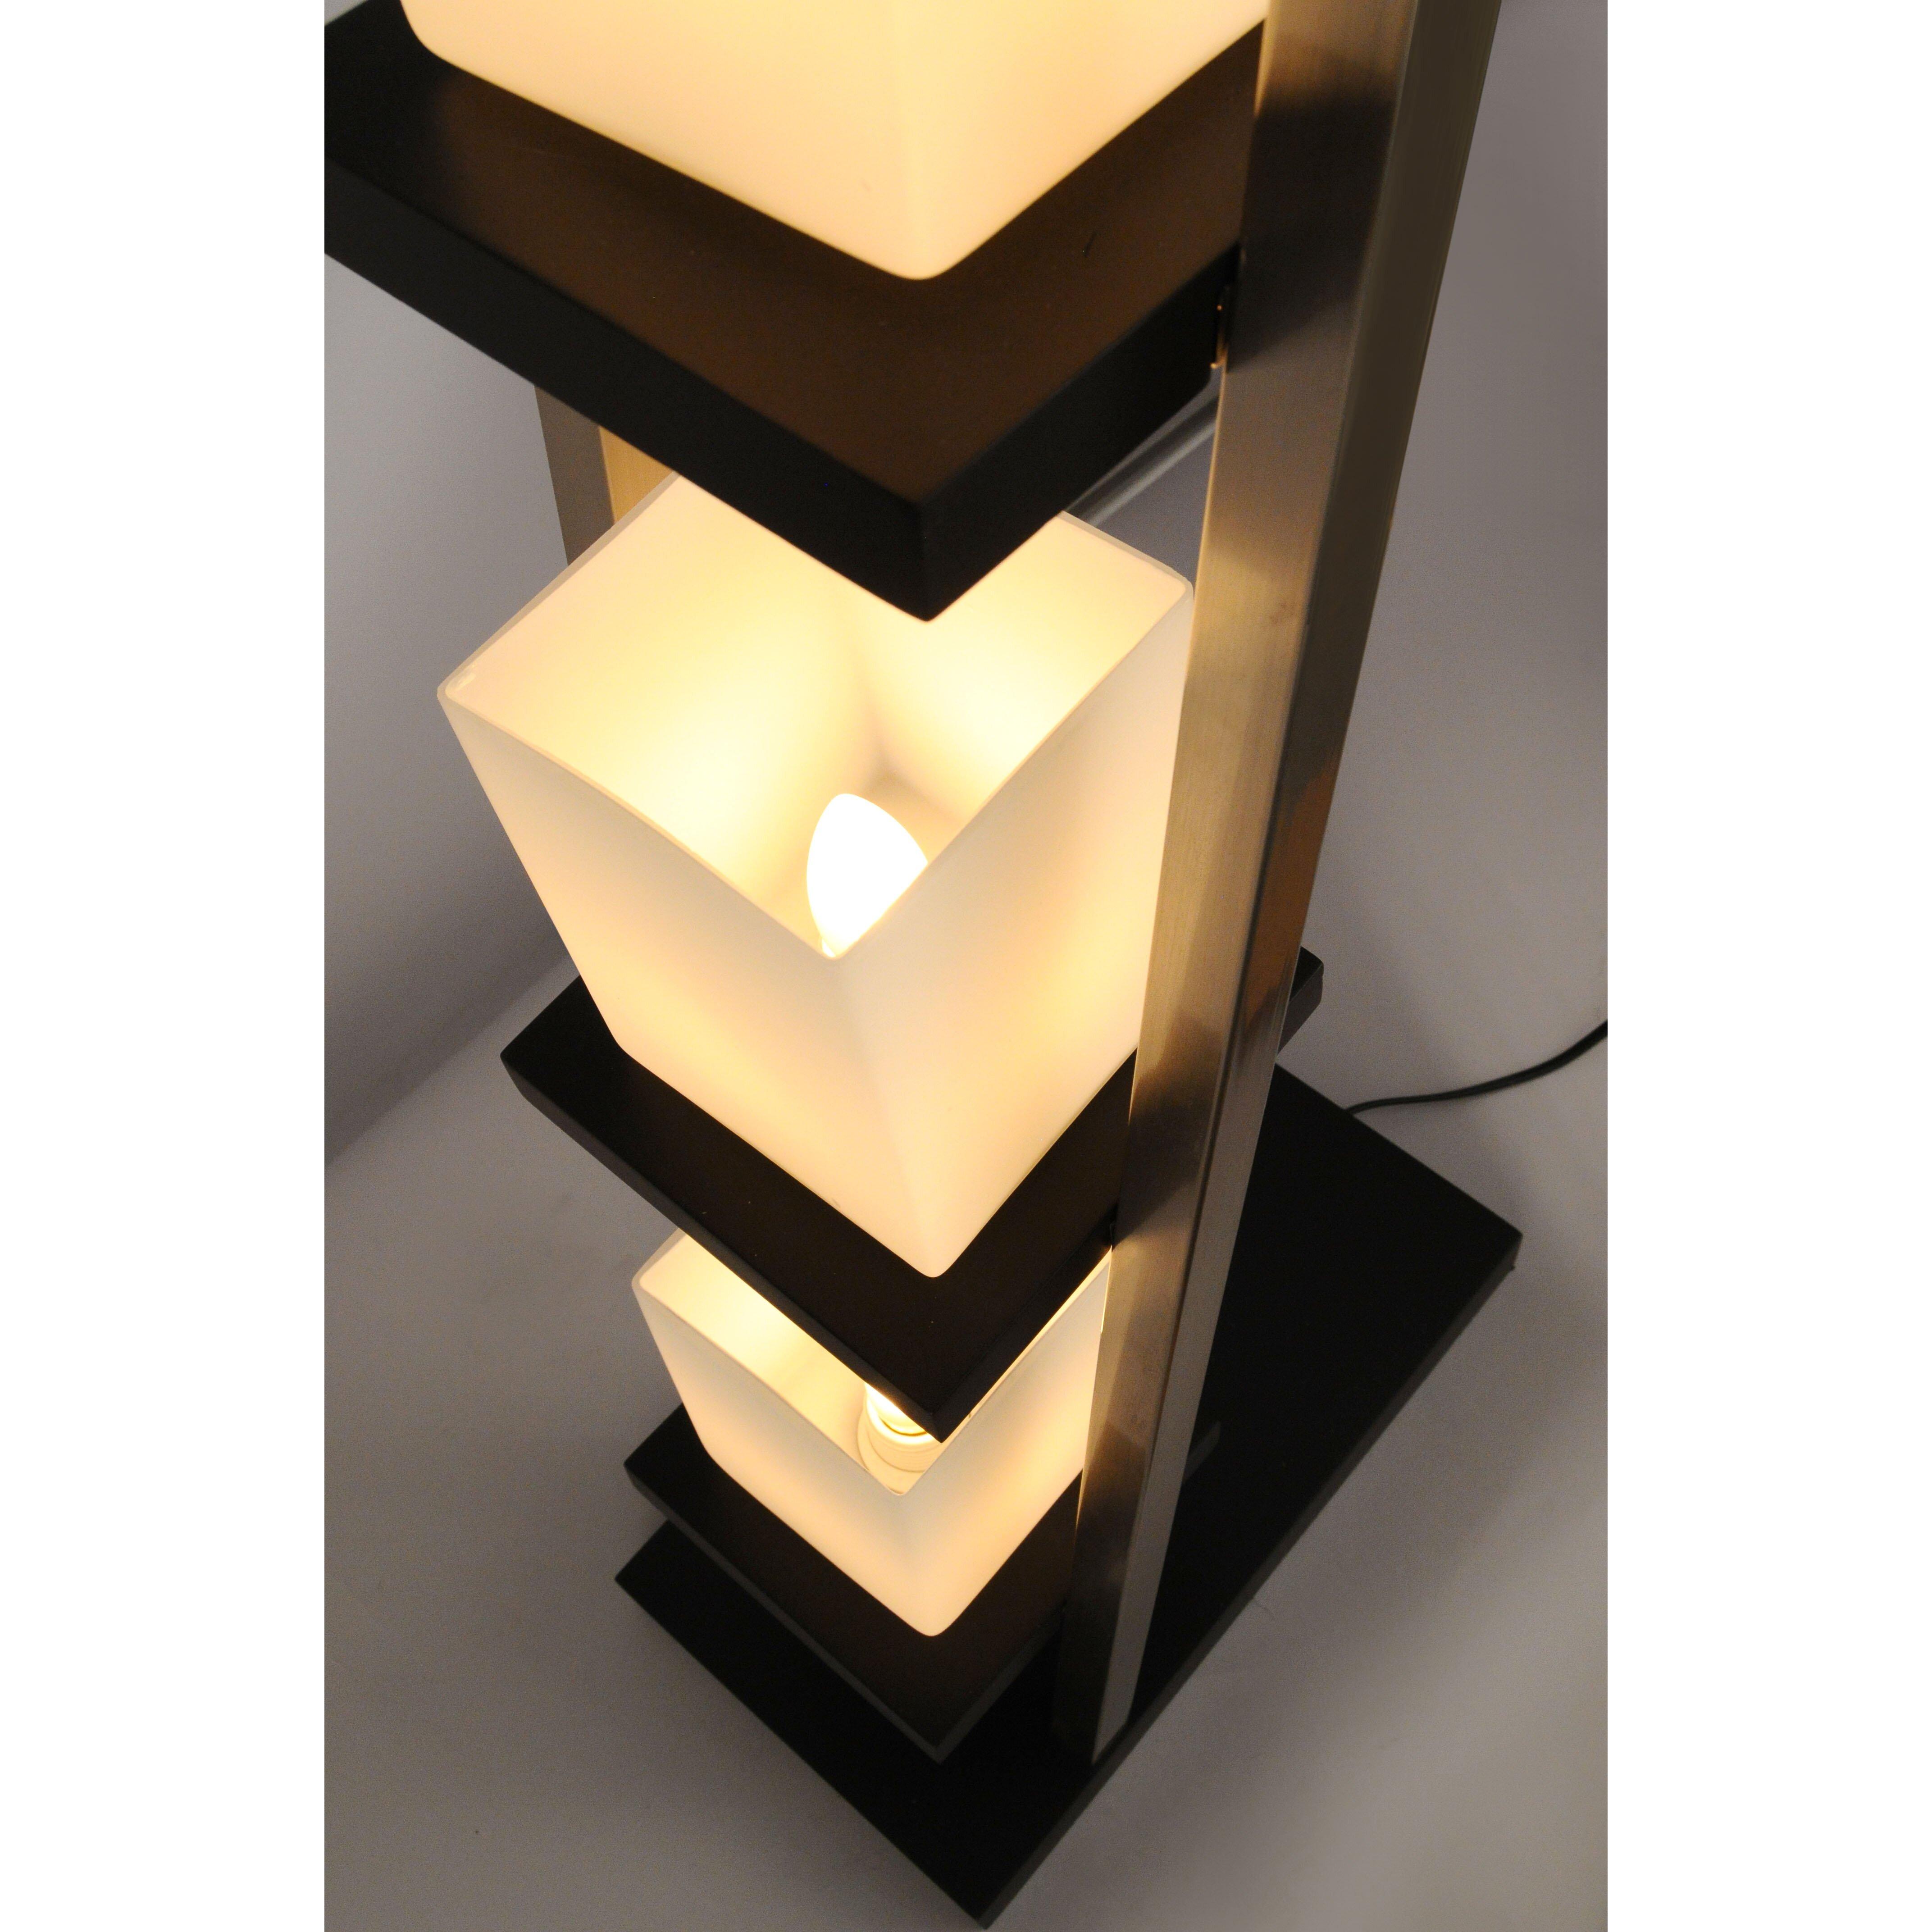 nova escalier 61 floor lamp reviews wayfair. Black Bedroom Furniture Sets. Home Design Ideas